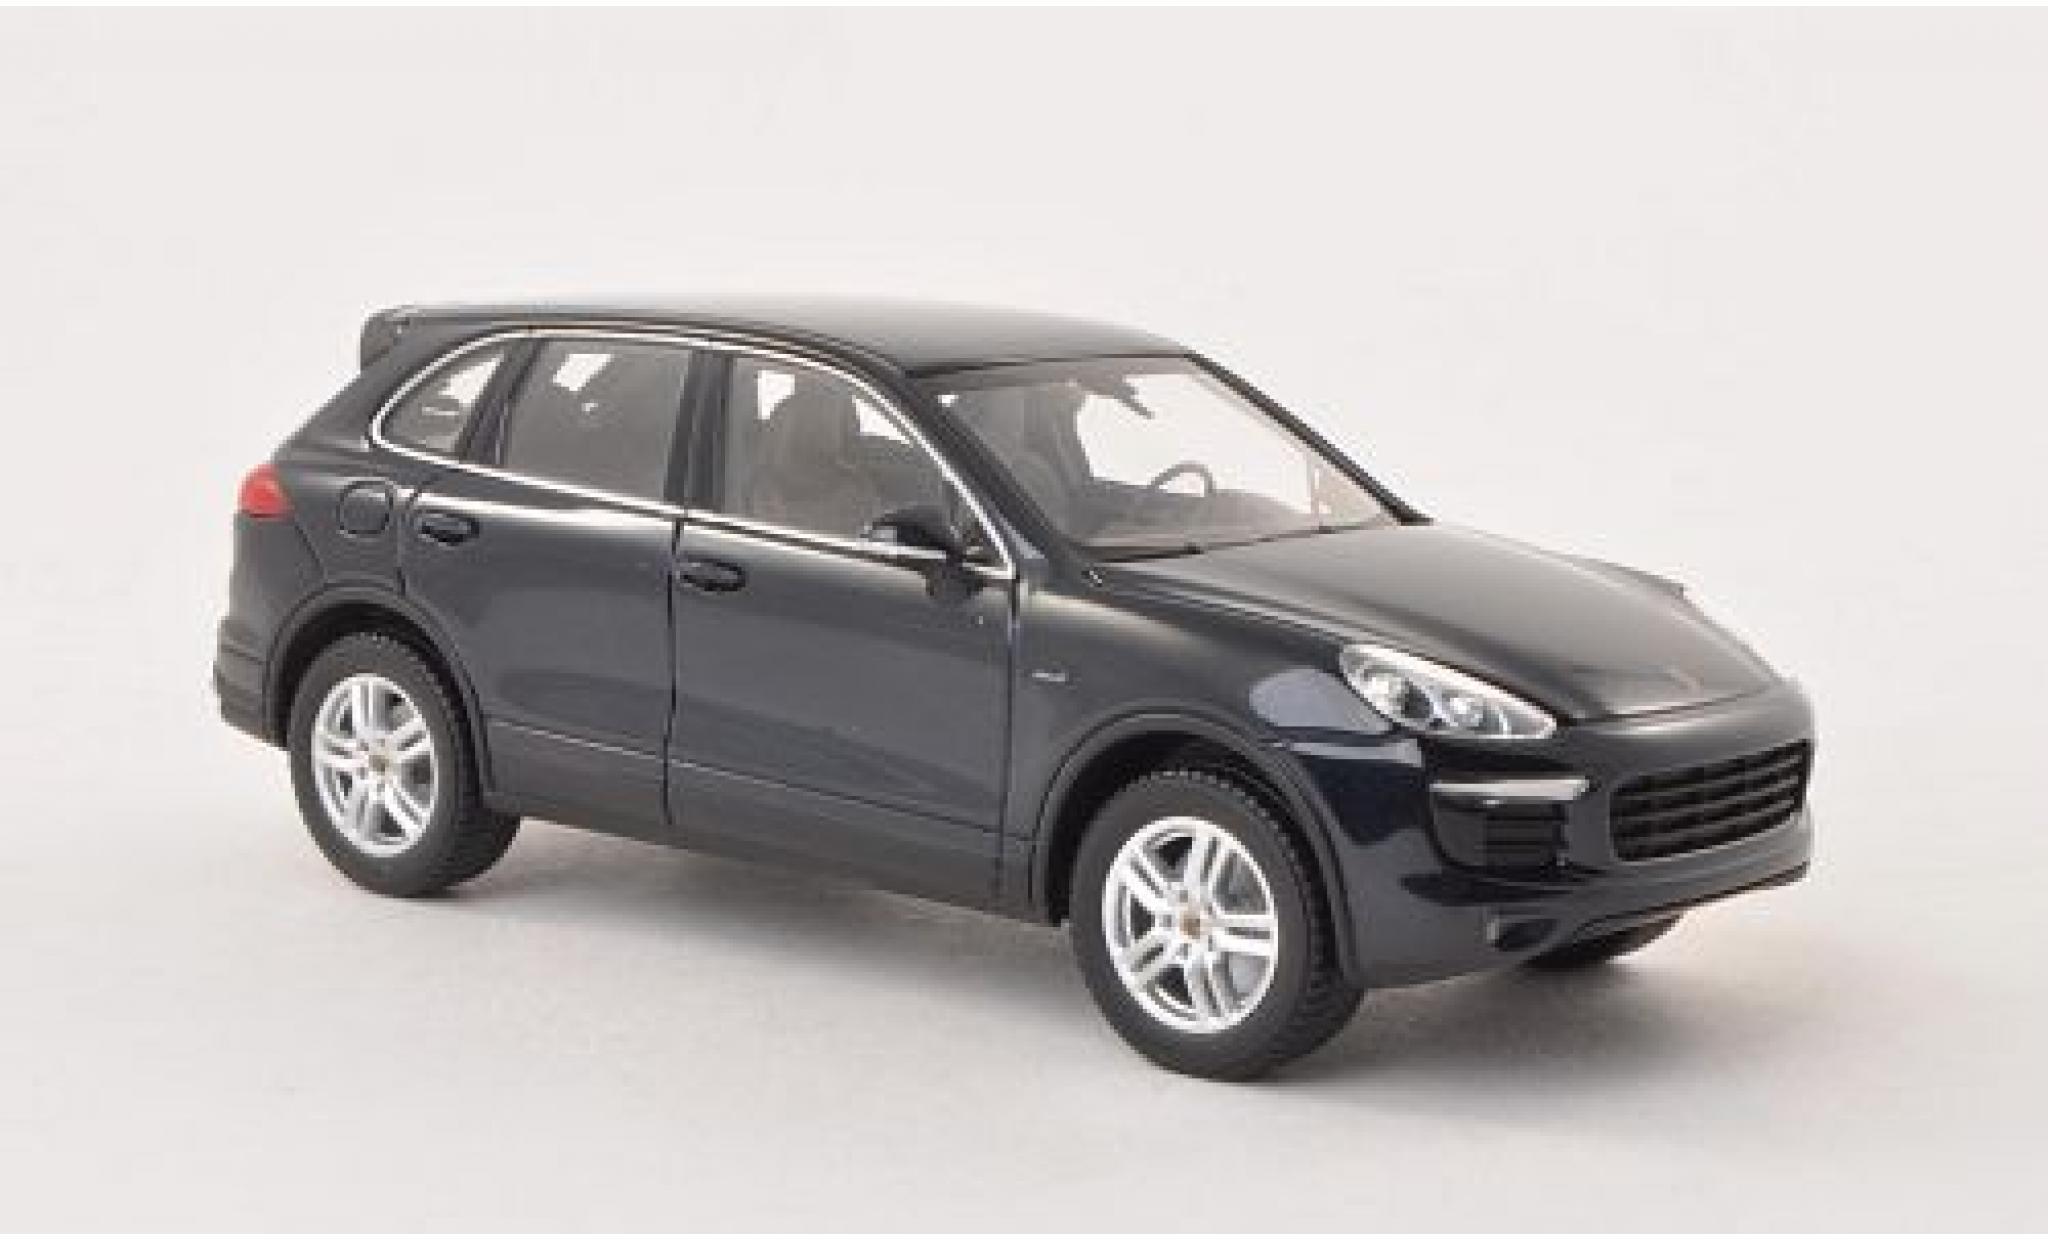 Porsche Cayenne S 1/43 Minichamps Diesel (92A) metallise bleue 2014